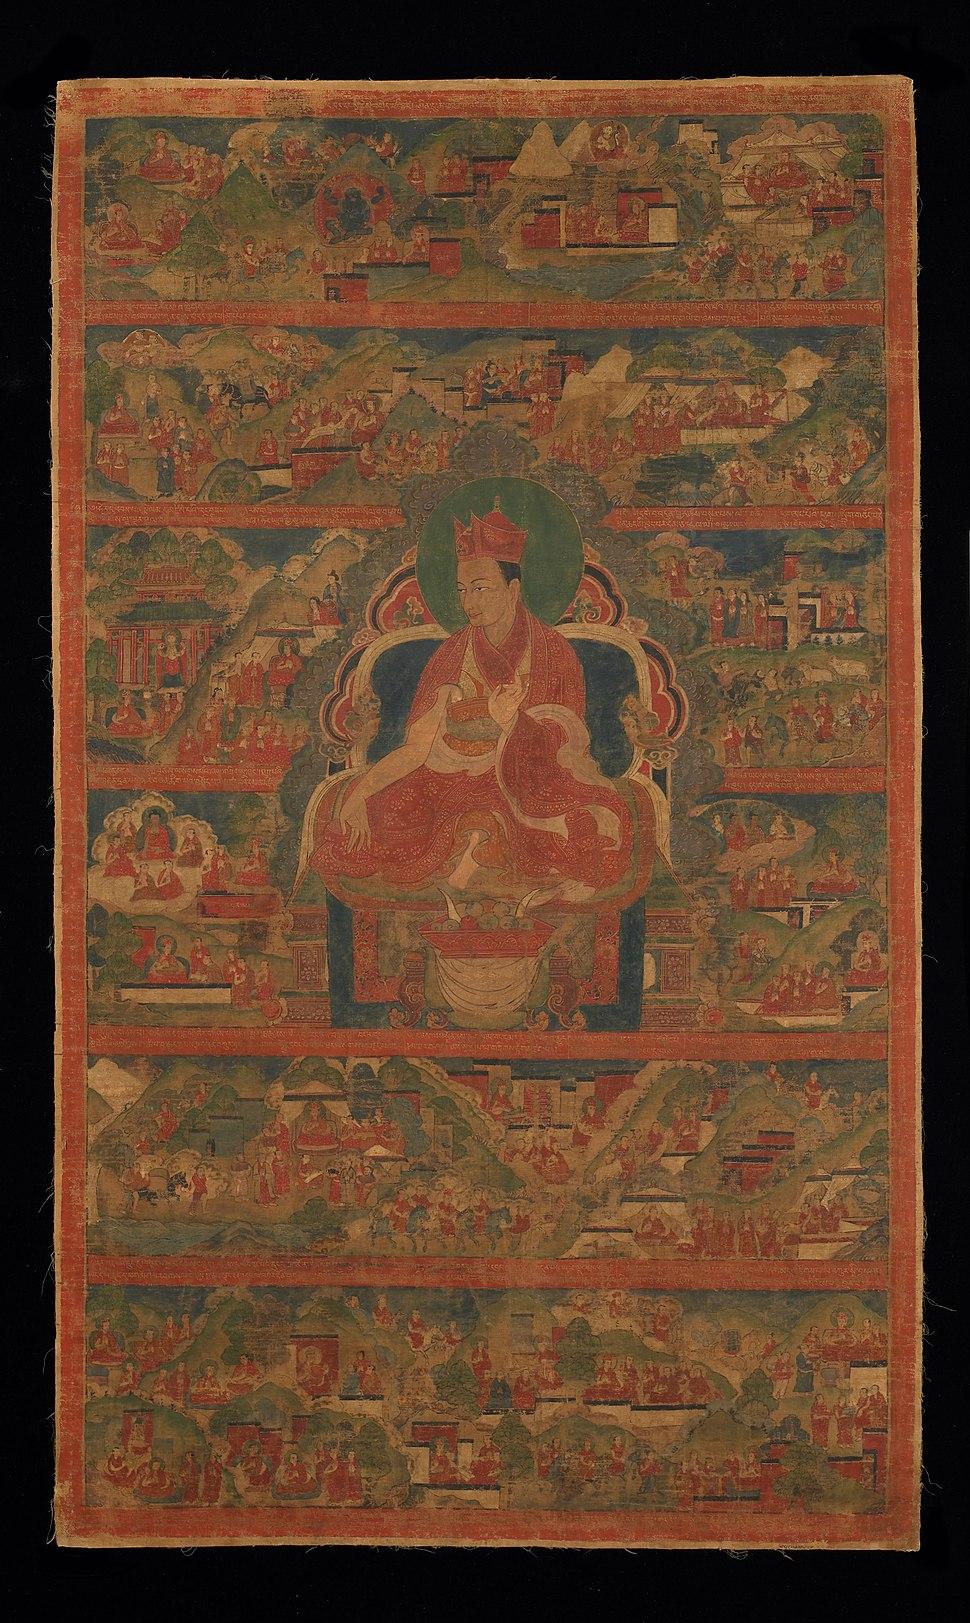 Sharmapa Lama, Chodag Yeshe Palzang, the 4th Shamar Rinpoche (1453-1554) - Google Art Project